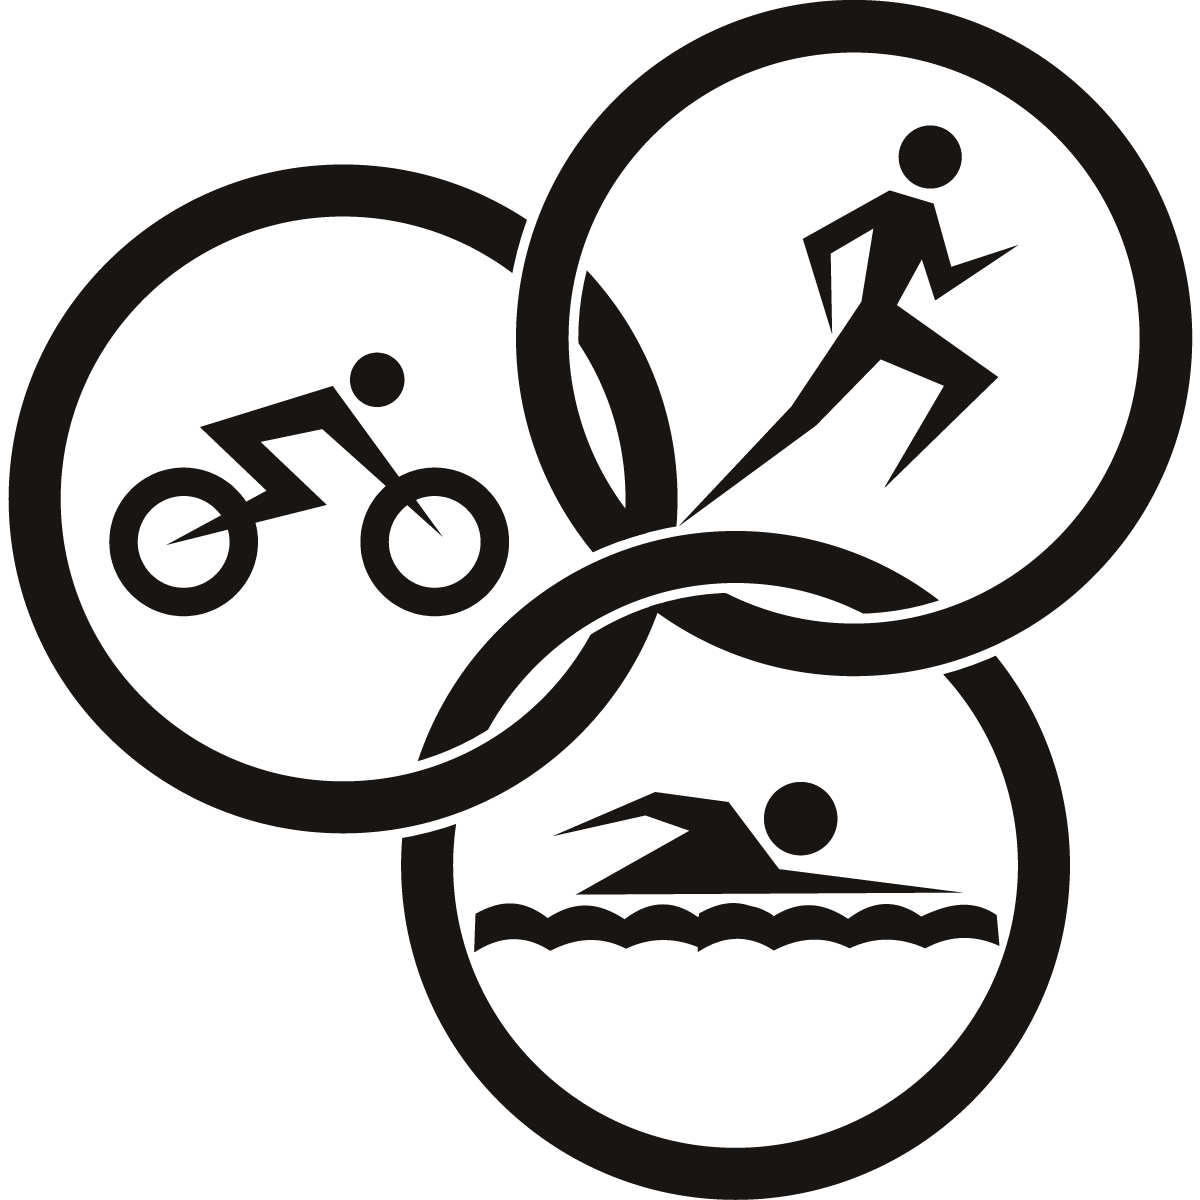 C2N Triathlon - coeur de nacre natation